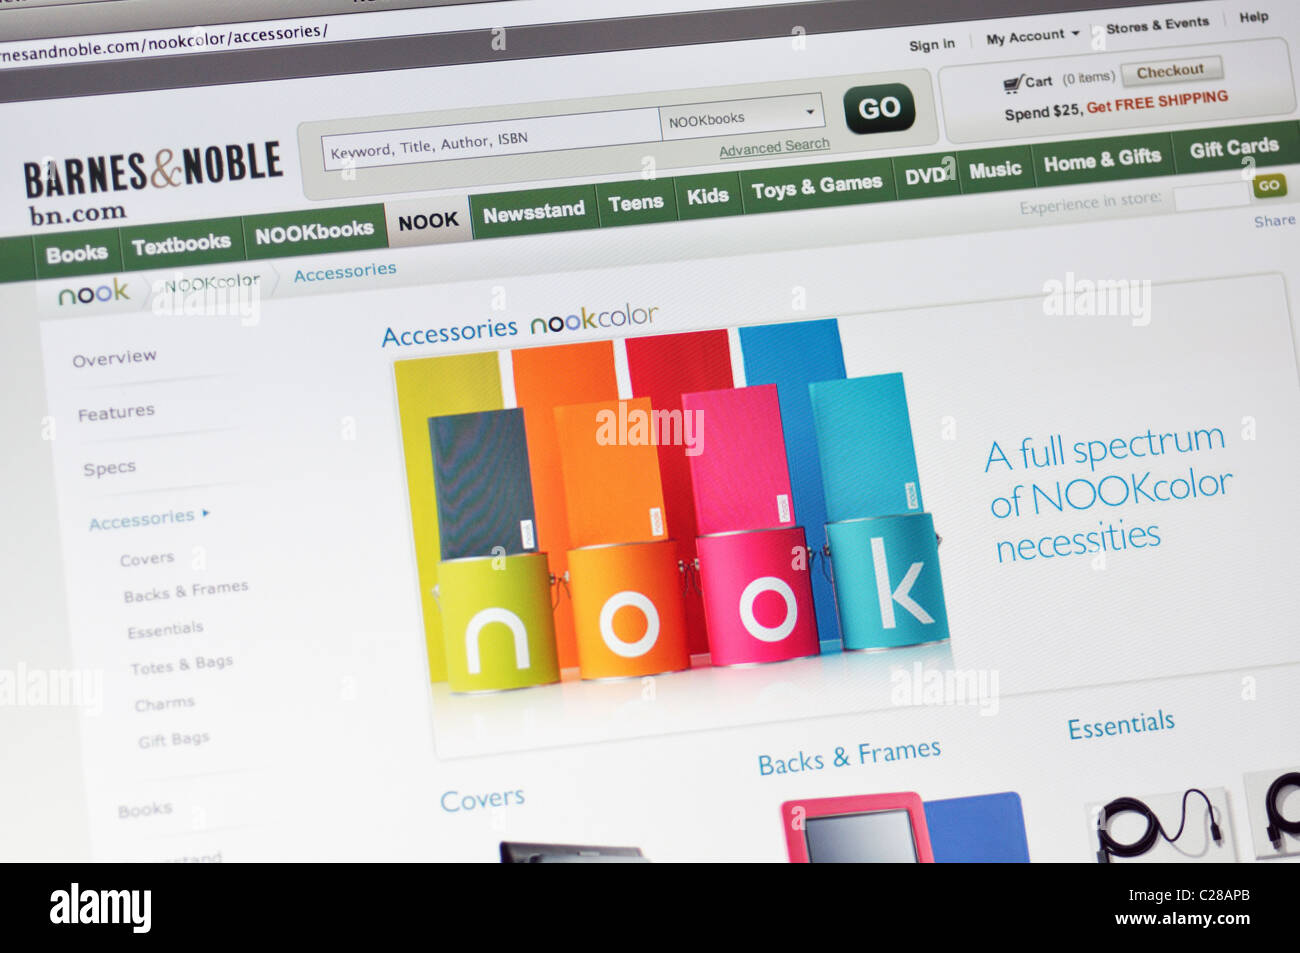 barnes noble bookstore website nook electronic book readers